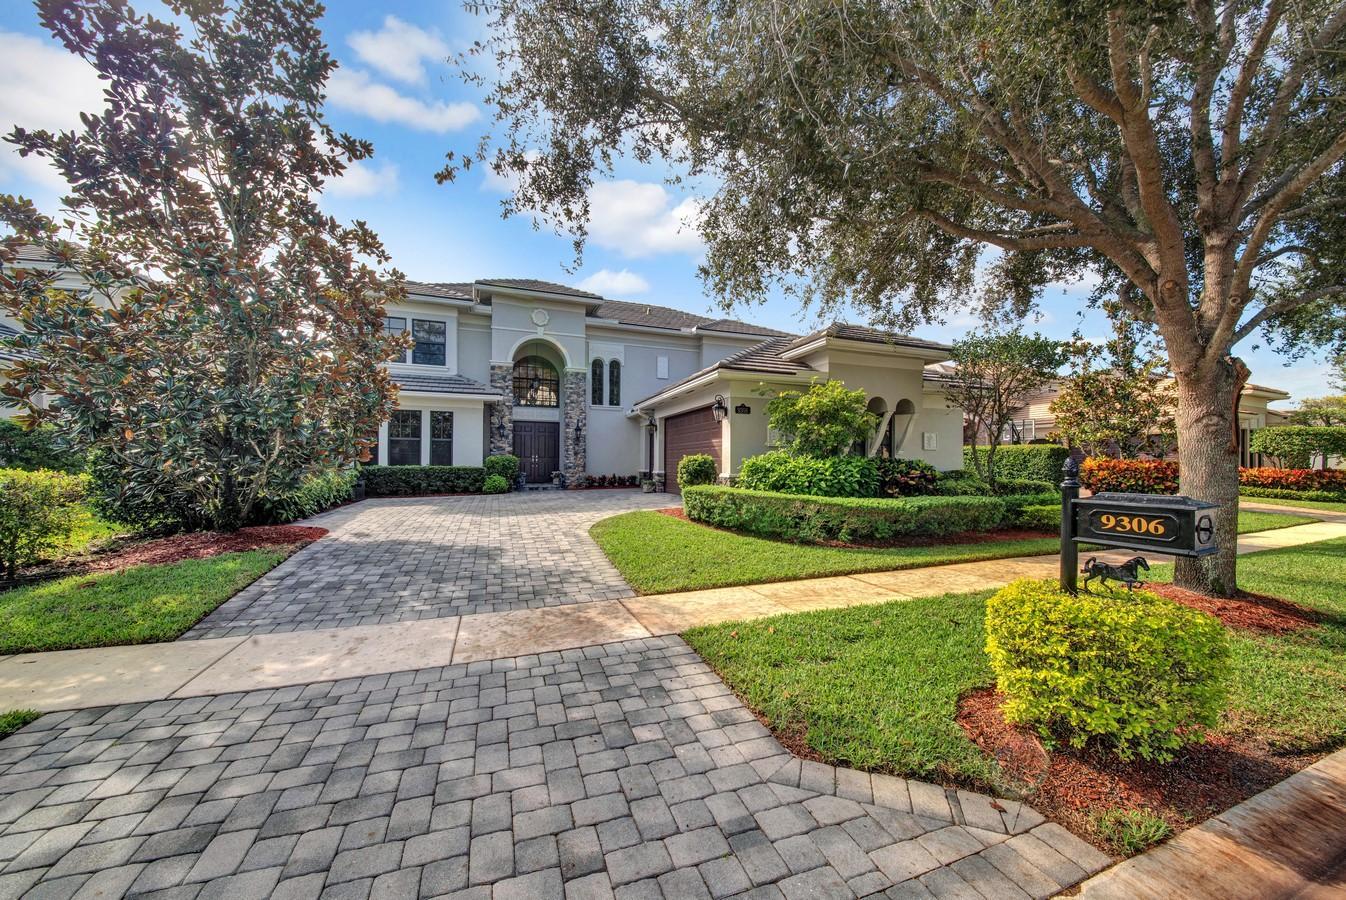 9306 Equus Circle, Boynton Beach, Florida 33472, 6 Bedrooms Bedrooms, ,5 BathroomsBathrooms,Single Family,For Sale,EQUUS,Equus,RX-10483407